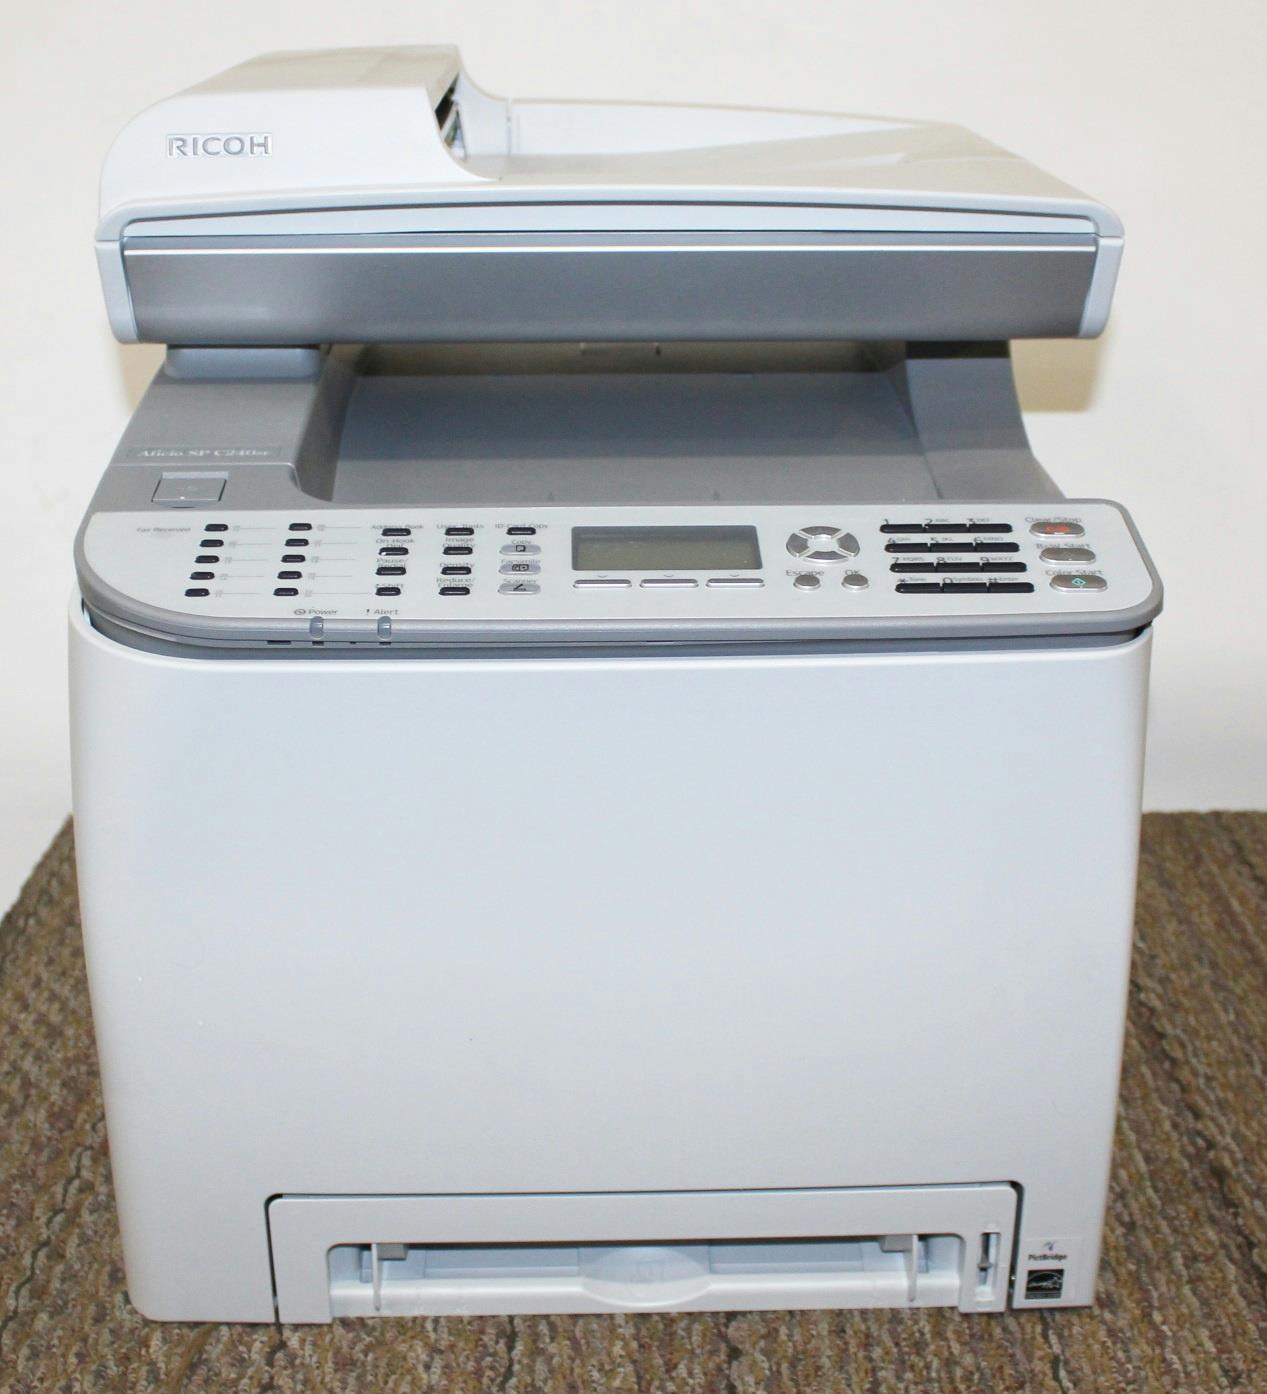 Ricoh Aficio SP C240SF Printer Driver for Windows 7